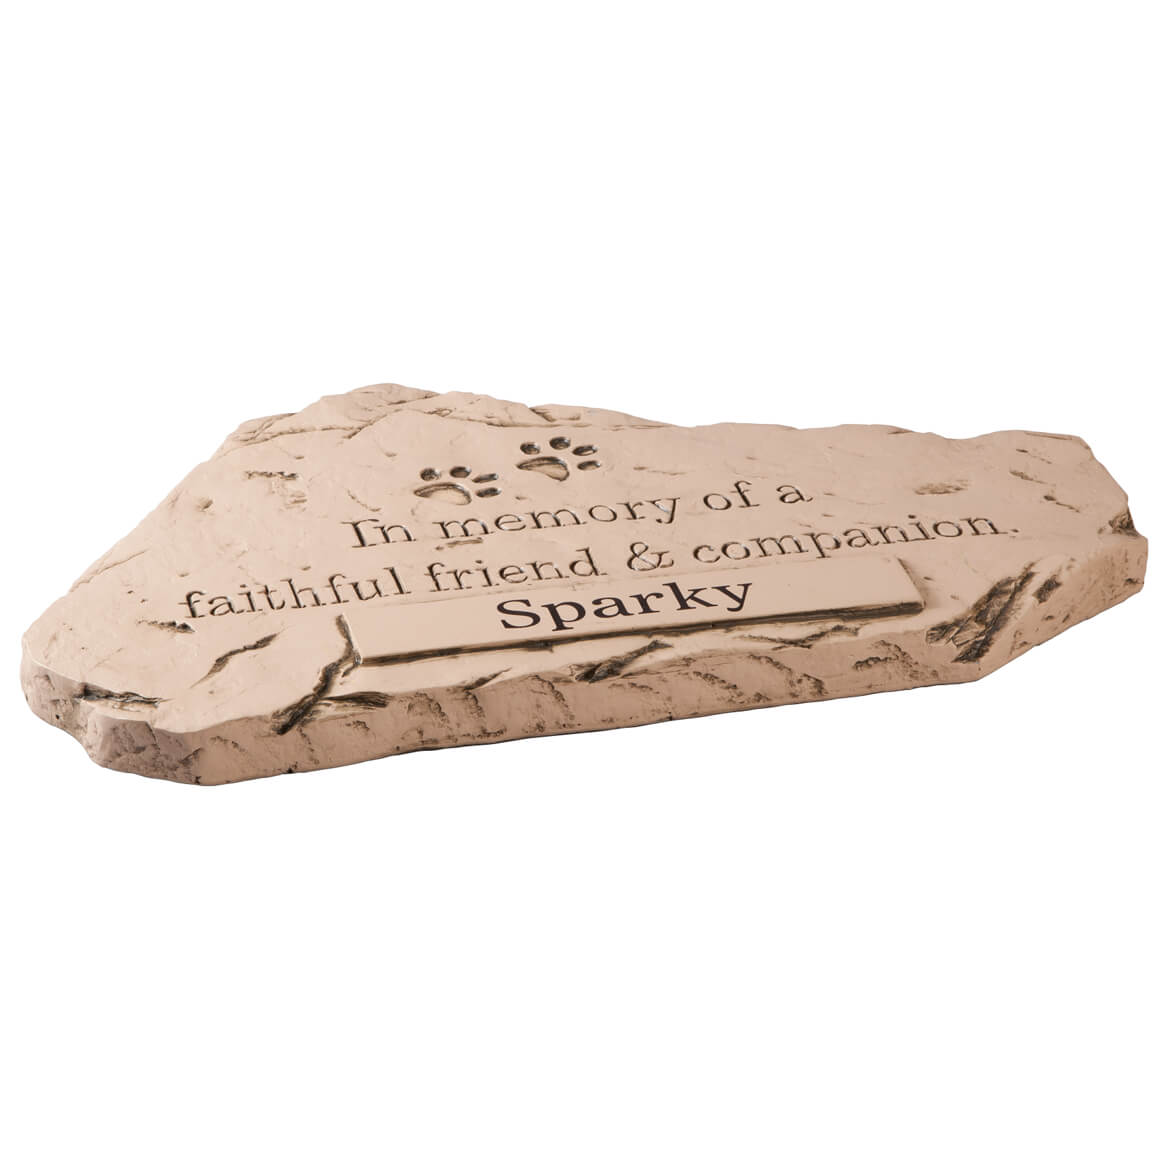 Personalized Faithful Friend and Companion Memorial Stone-359781